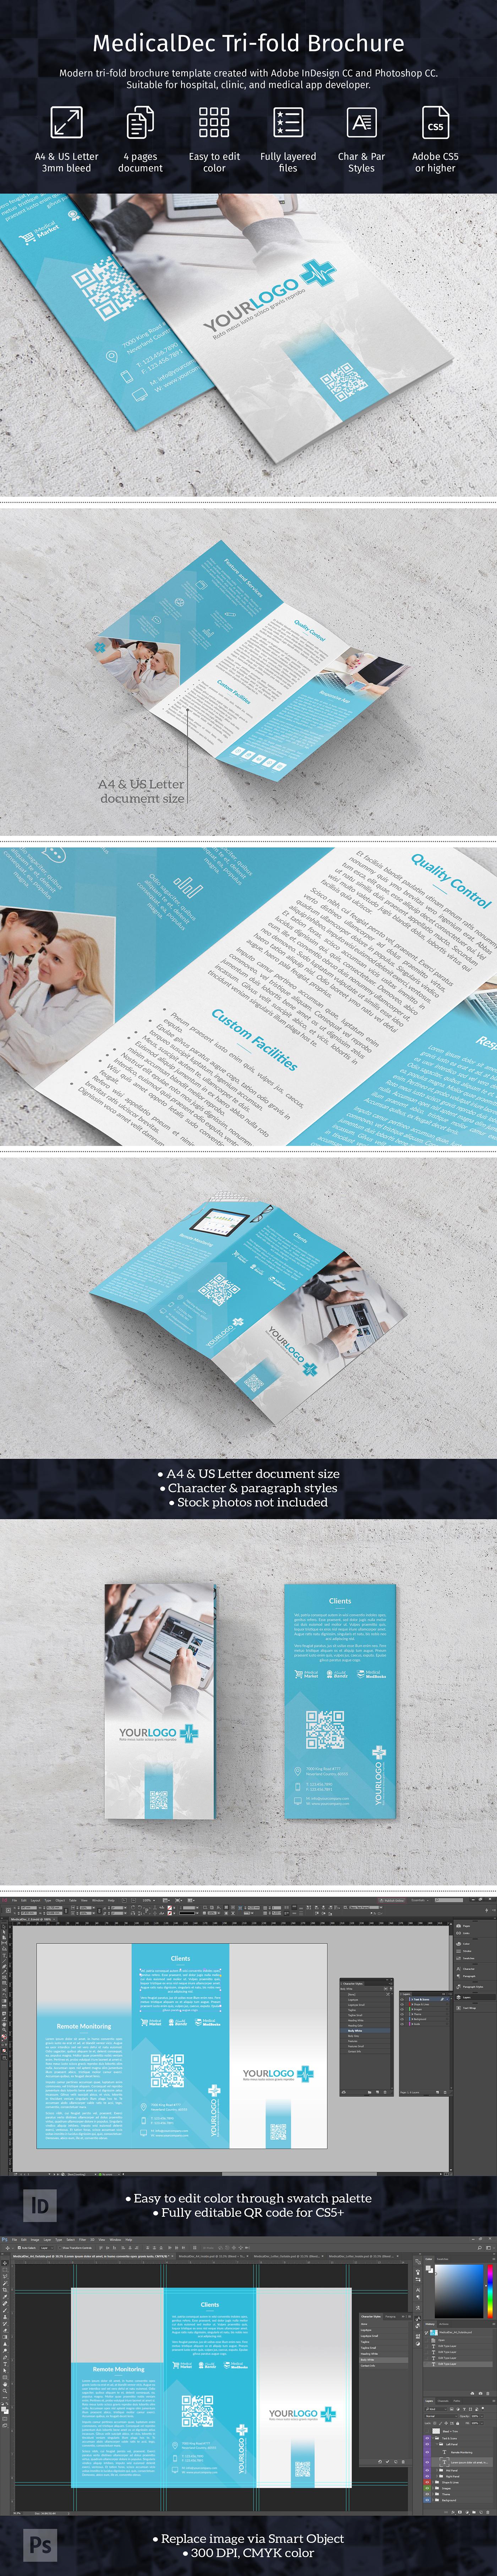 Medicaldec Trifold Brochure Template On Behance